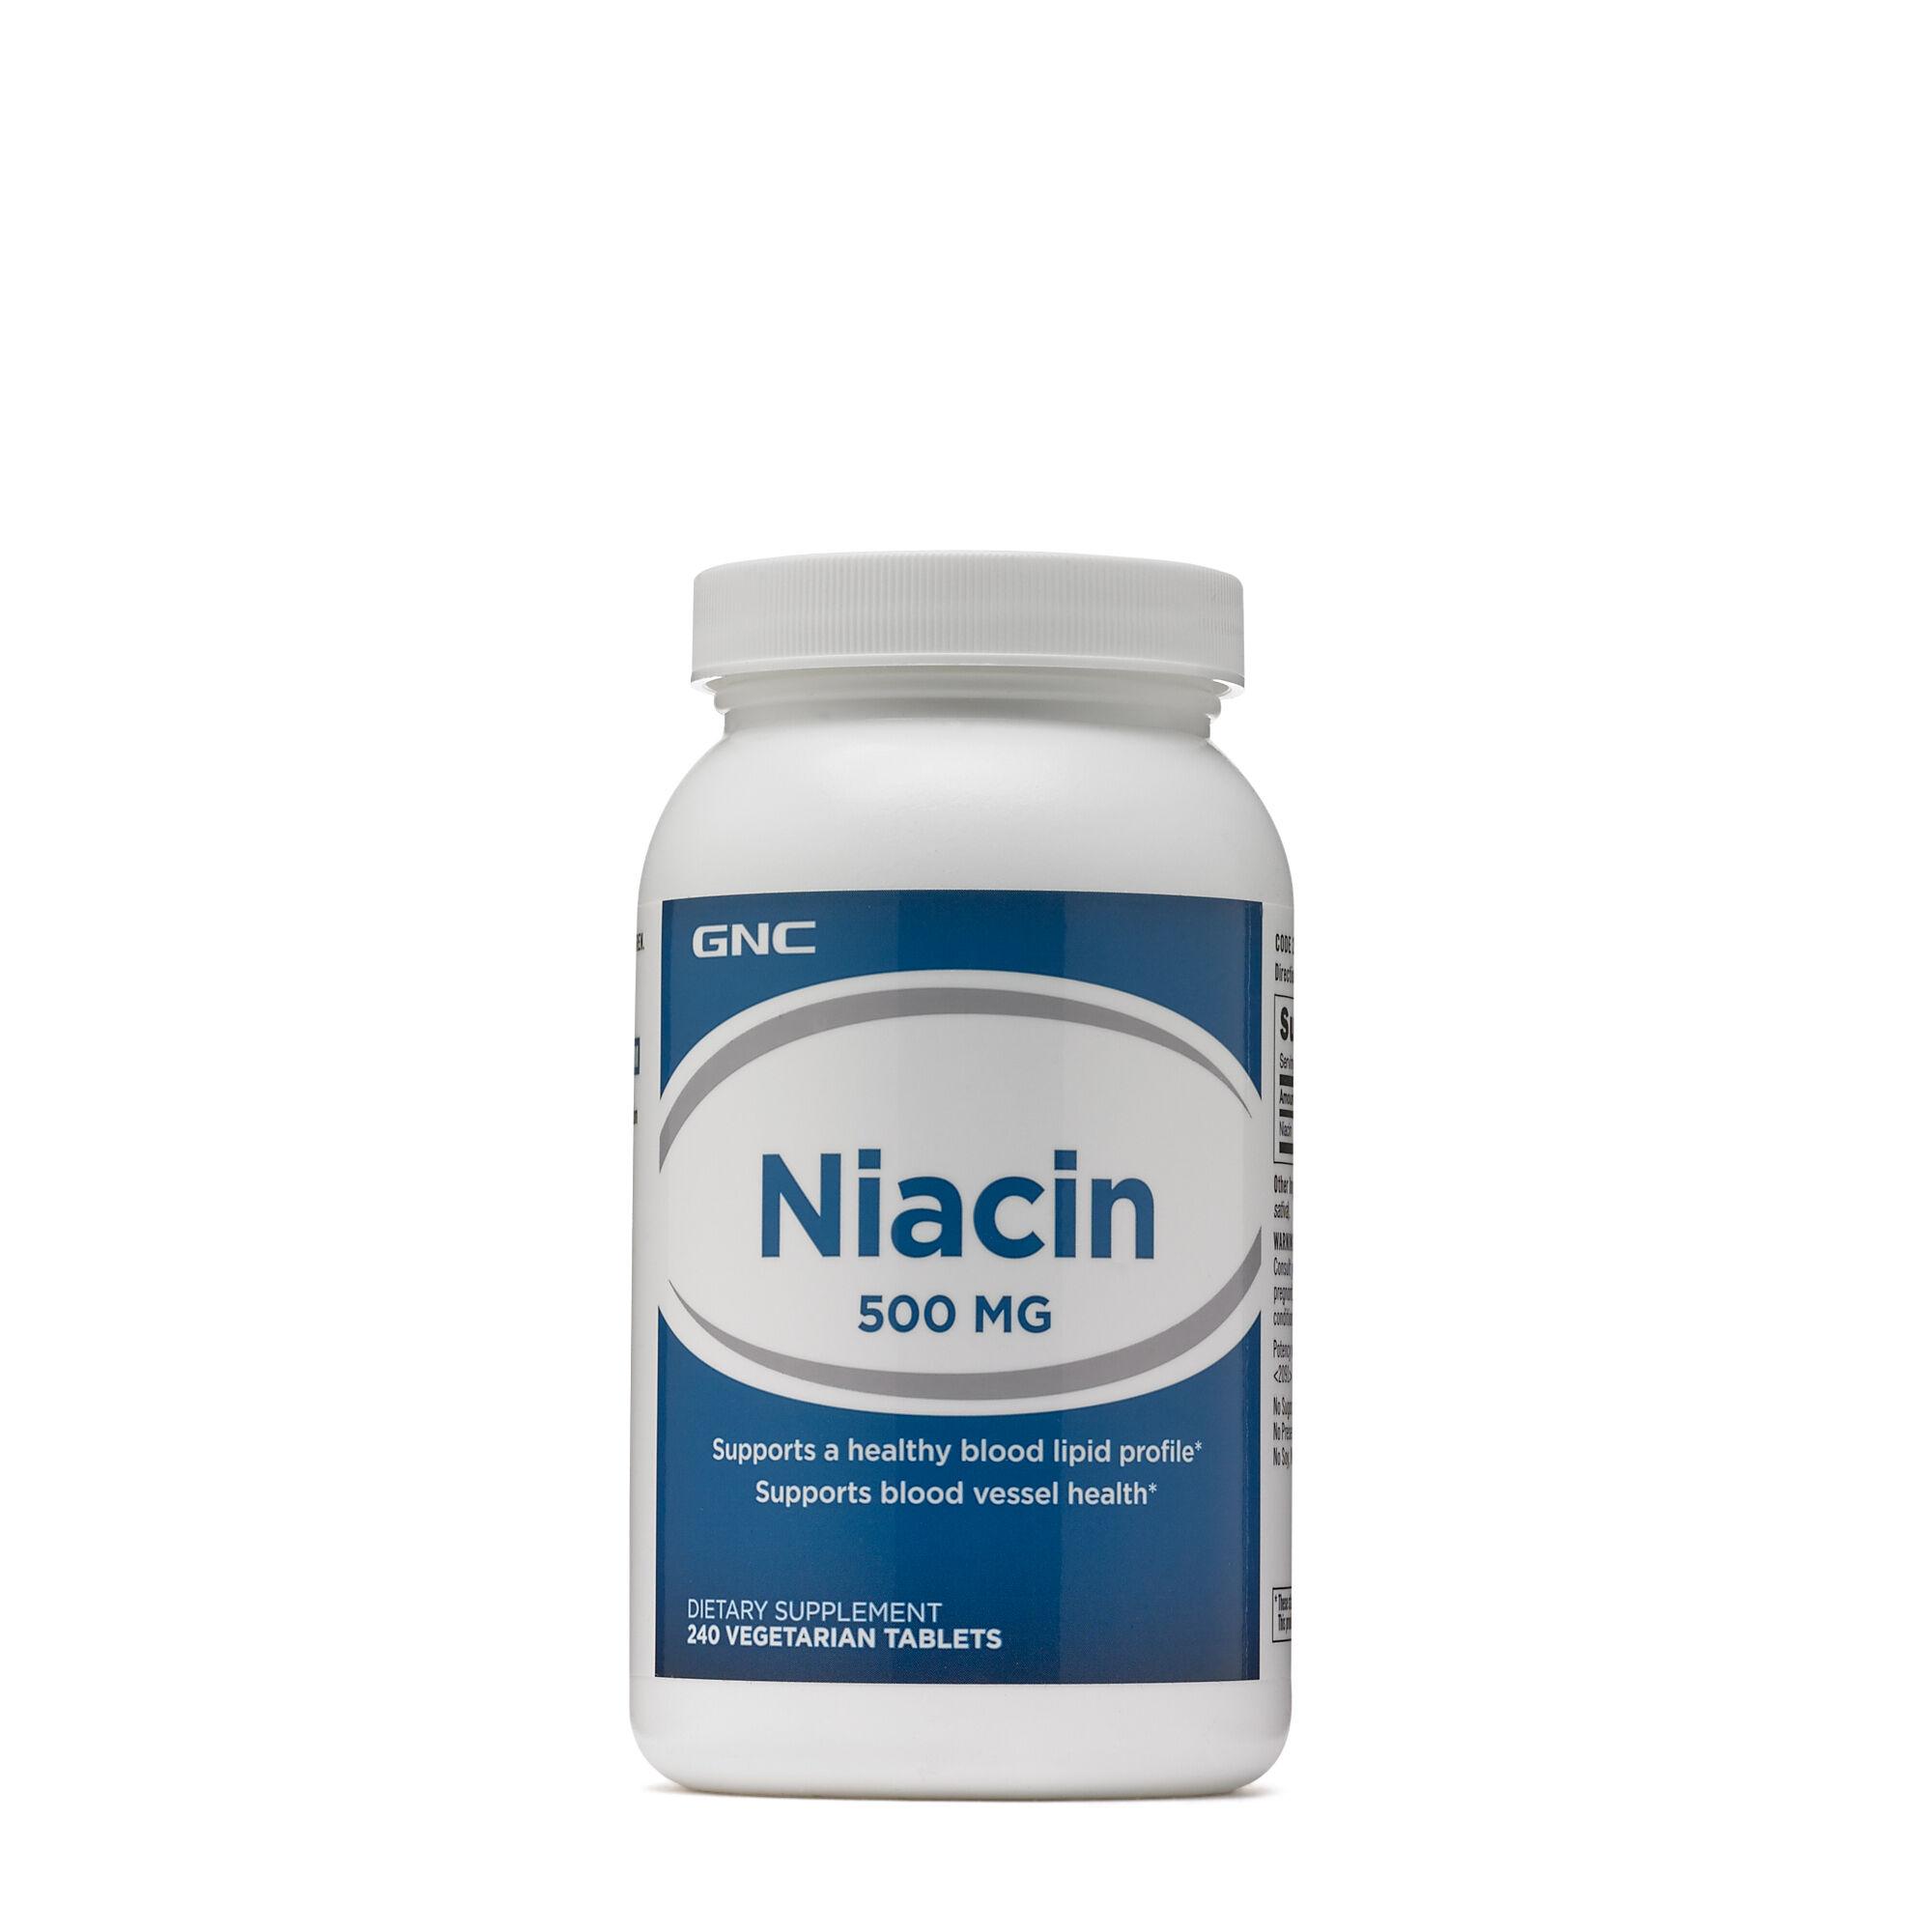 GNC Niacin 500 mg | GNC